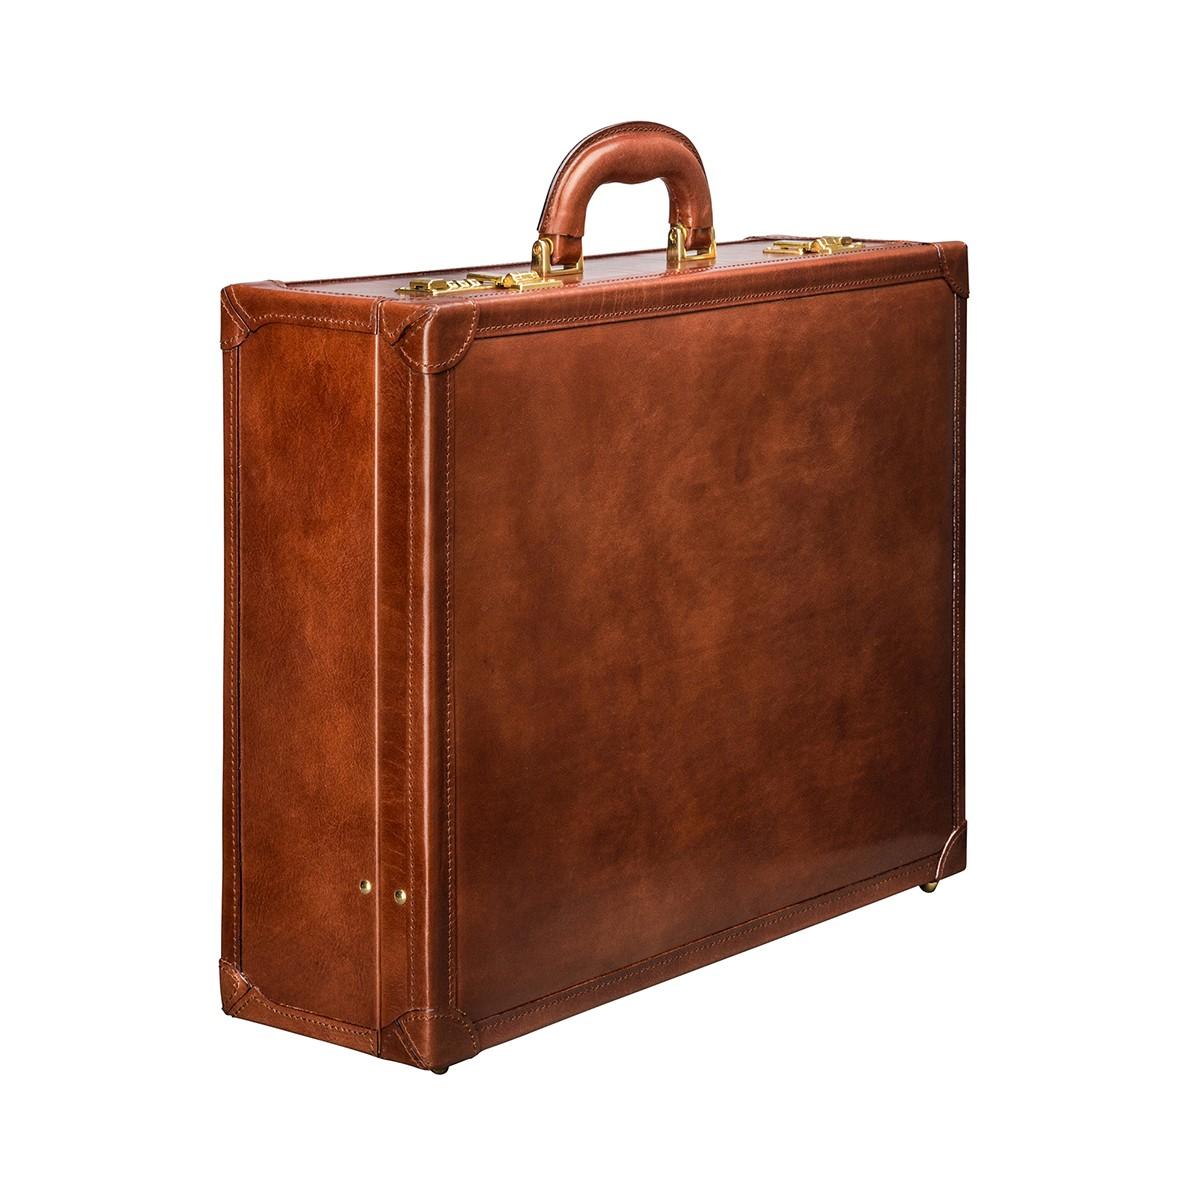 Briefcase clipart business. Maxwell scott the calvino